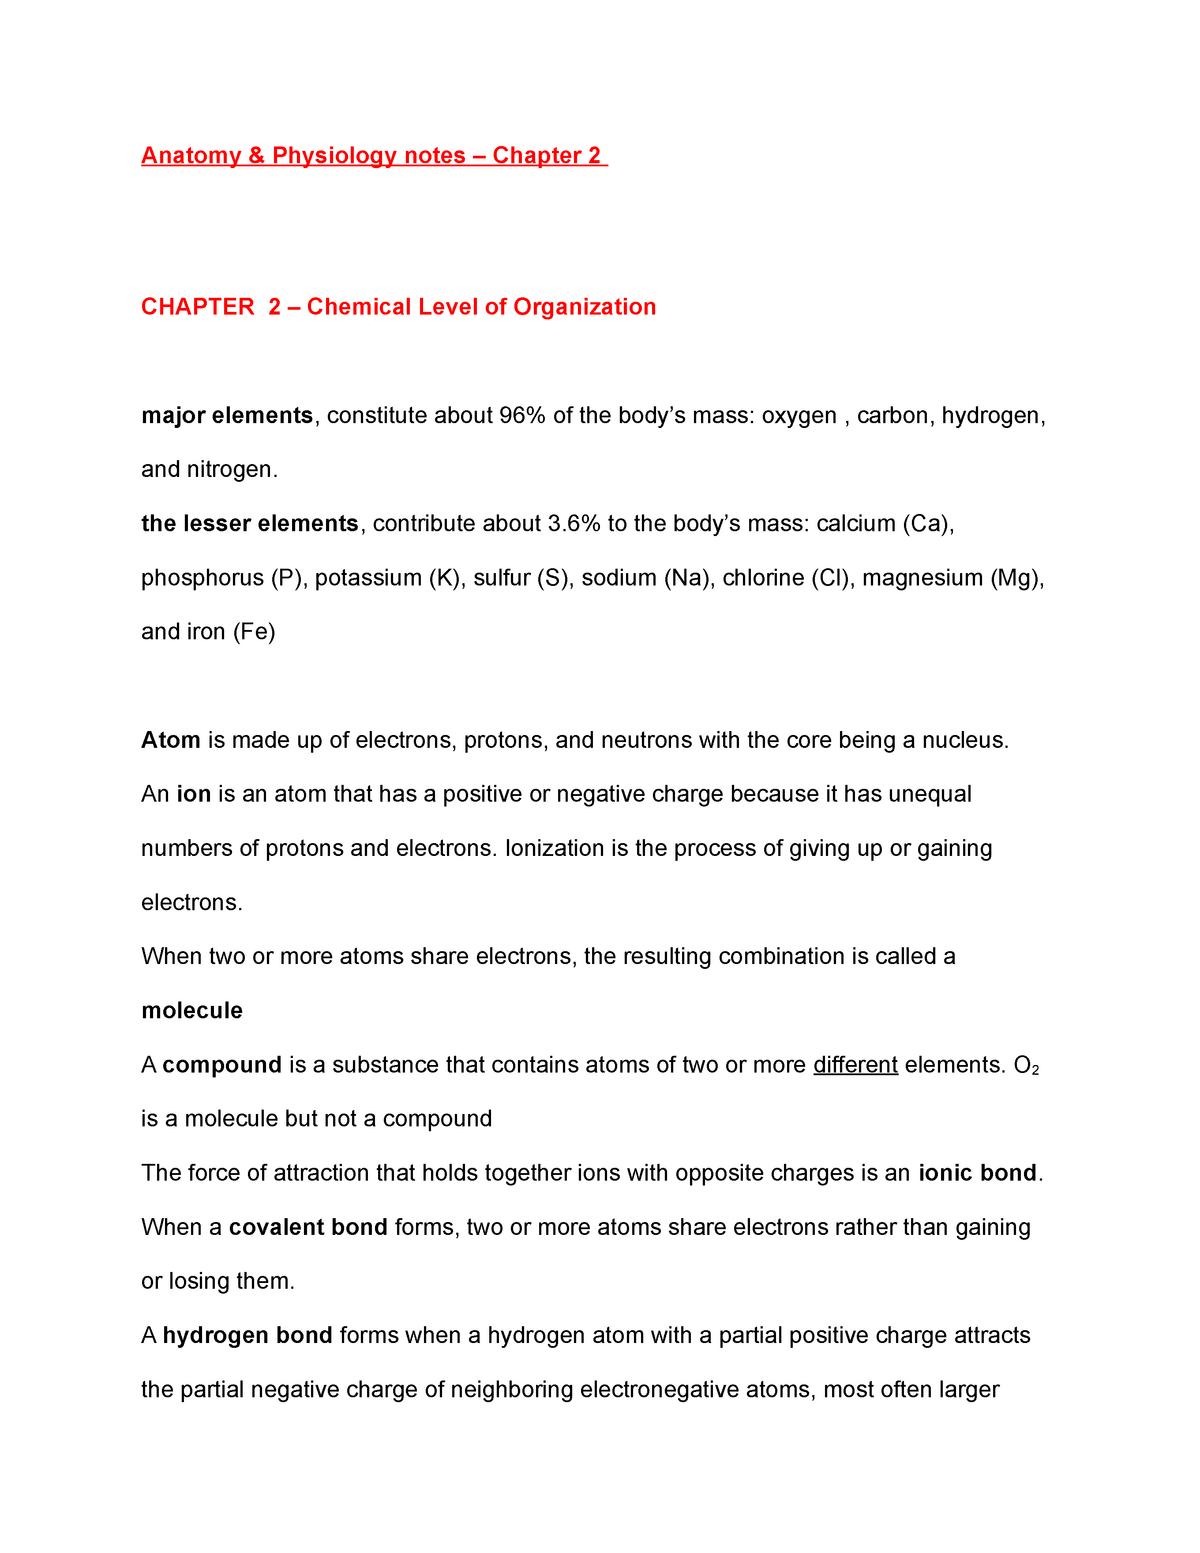 Anatomy & Physiology Chapter 2 - BIOL 235 Biology - AU - StuDocu